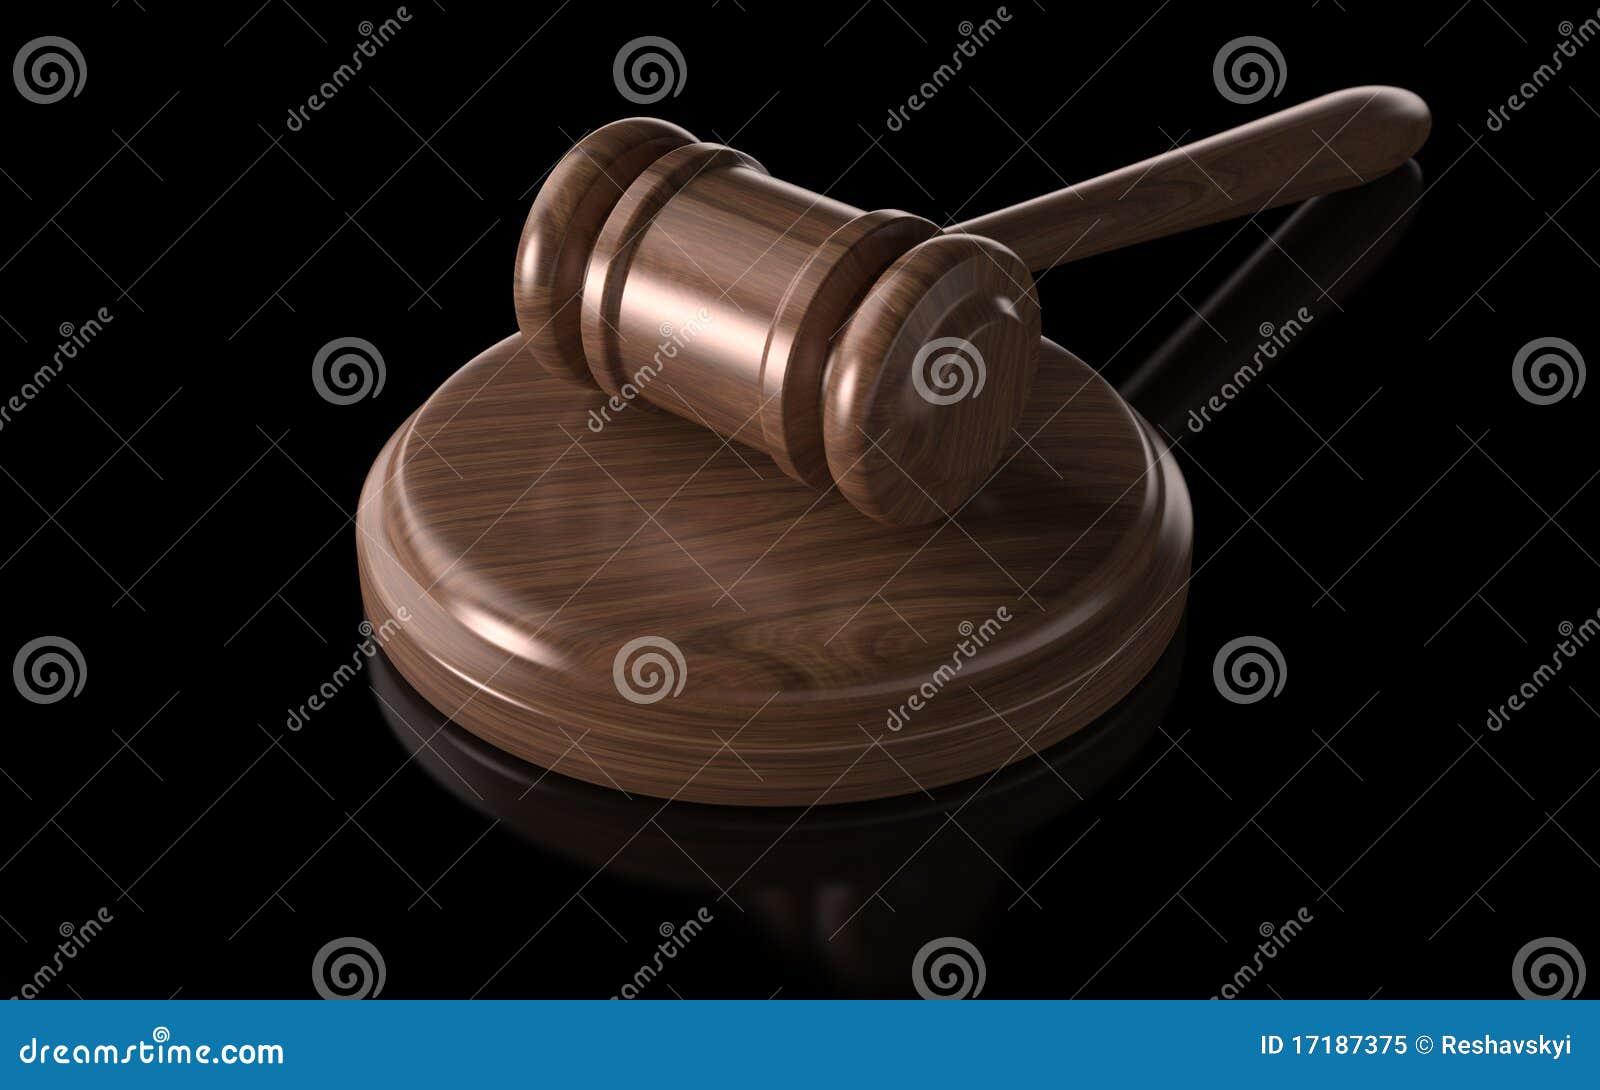 Judge's Gavel Royalty Free Stock Photo - Image: 17187375